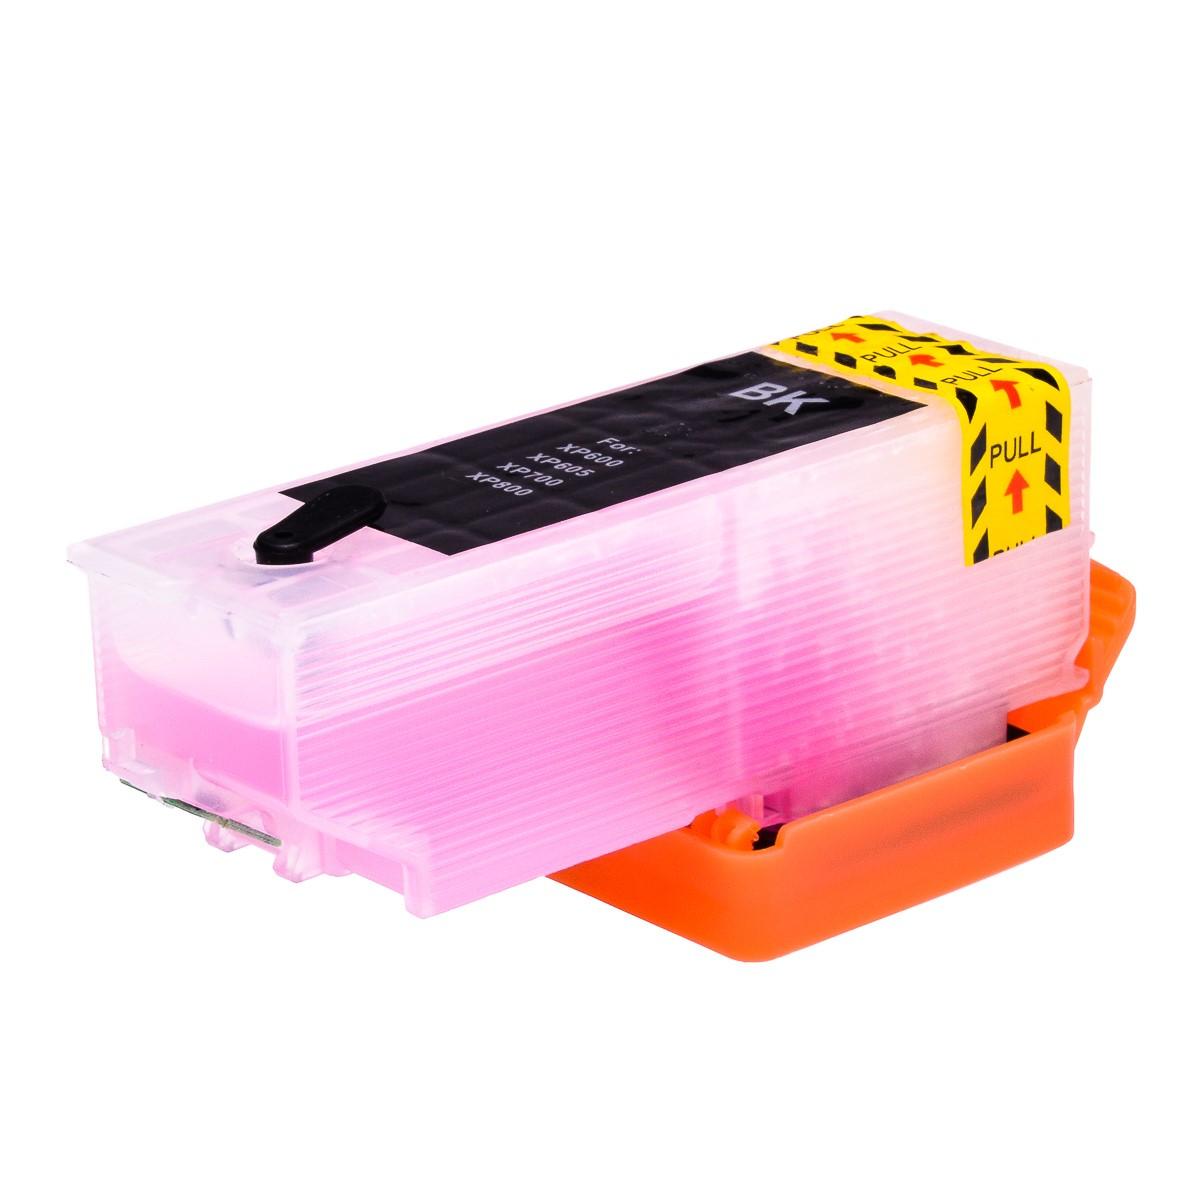 Black printhead cleaning cartridge for Epson XP-645 printer